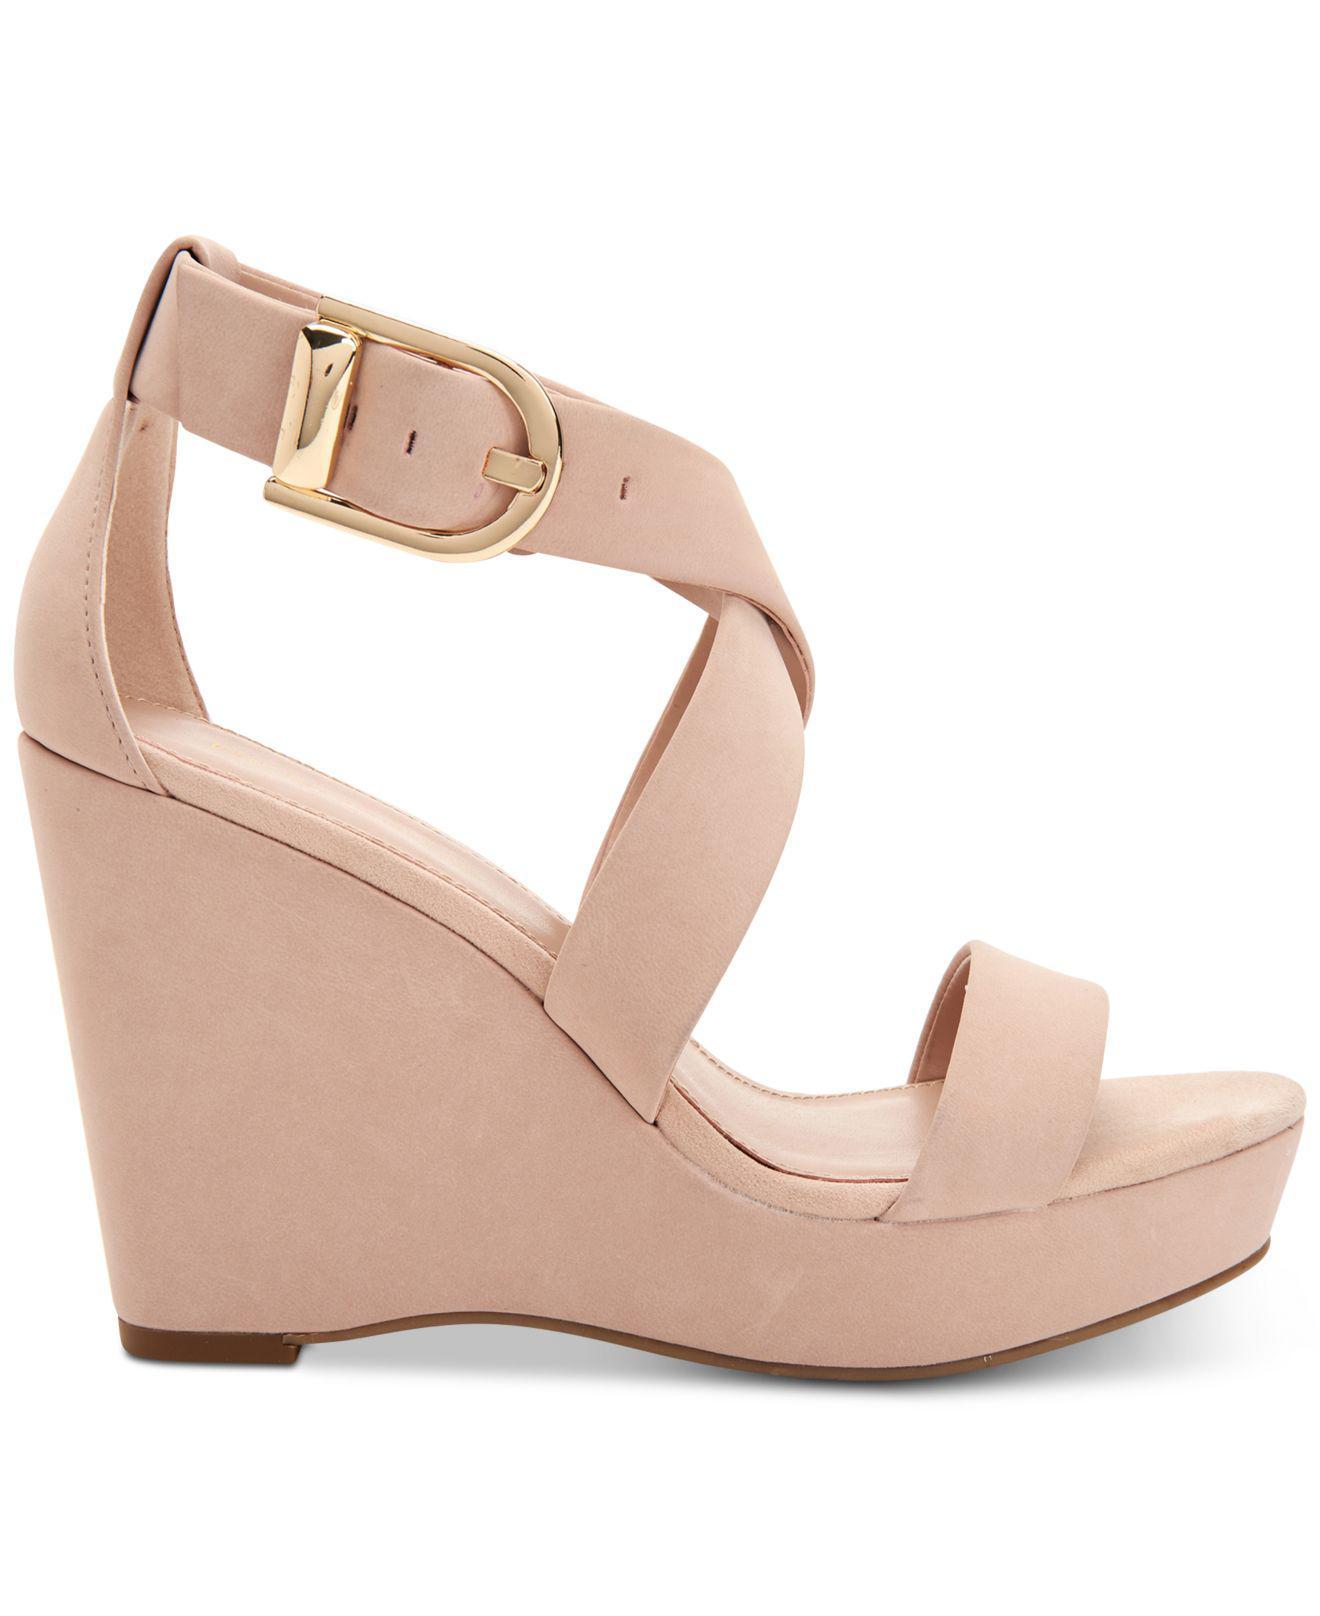 BCBGeneration Jae Platform Wedge Sandals Women's Shoes 3ALwS4